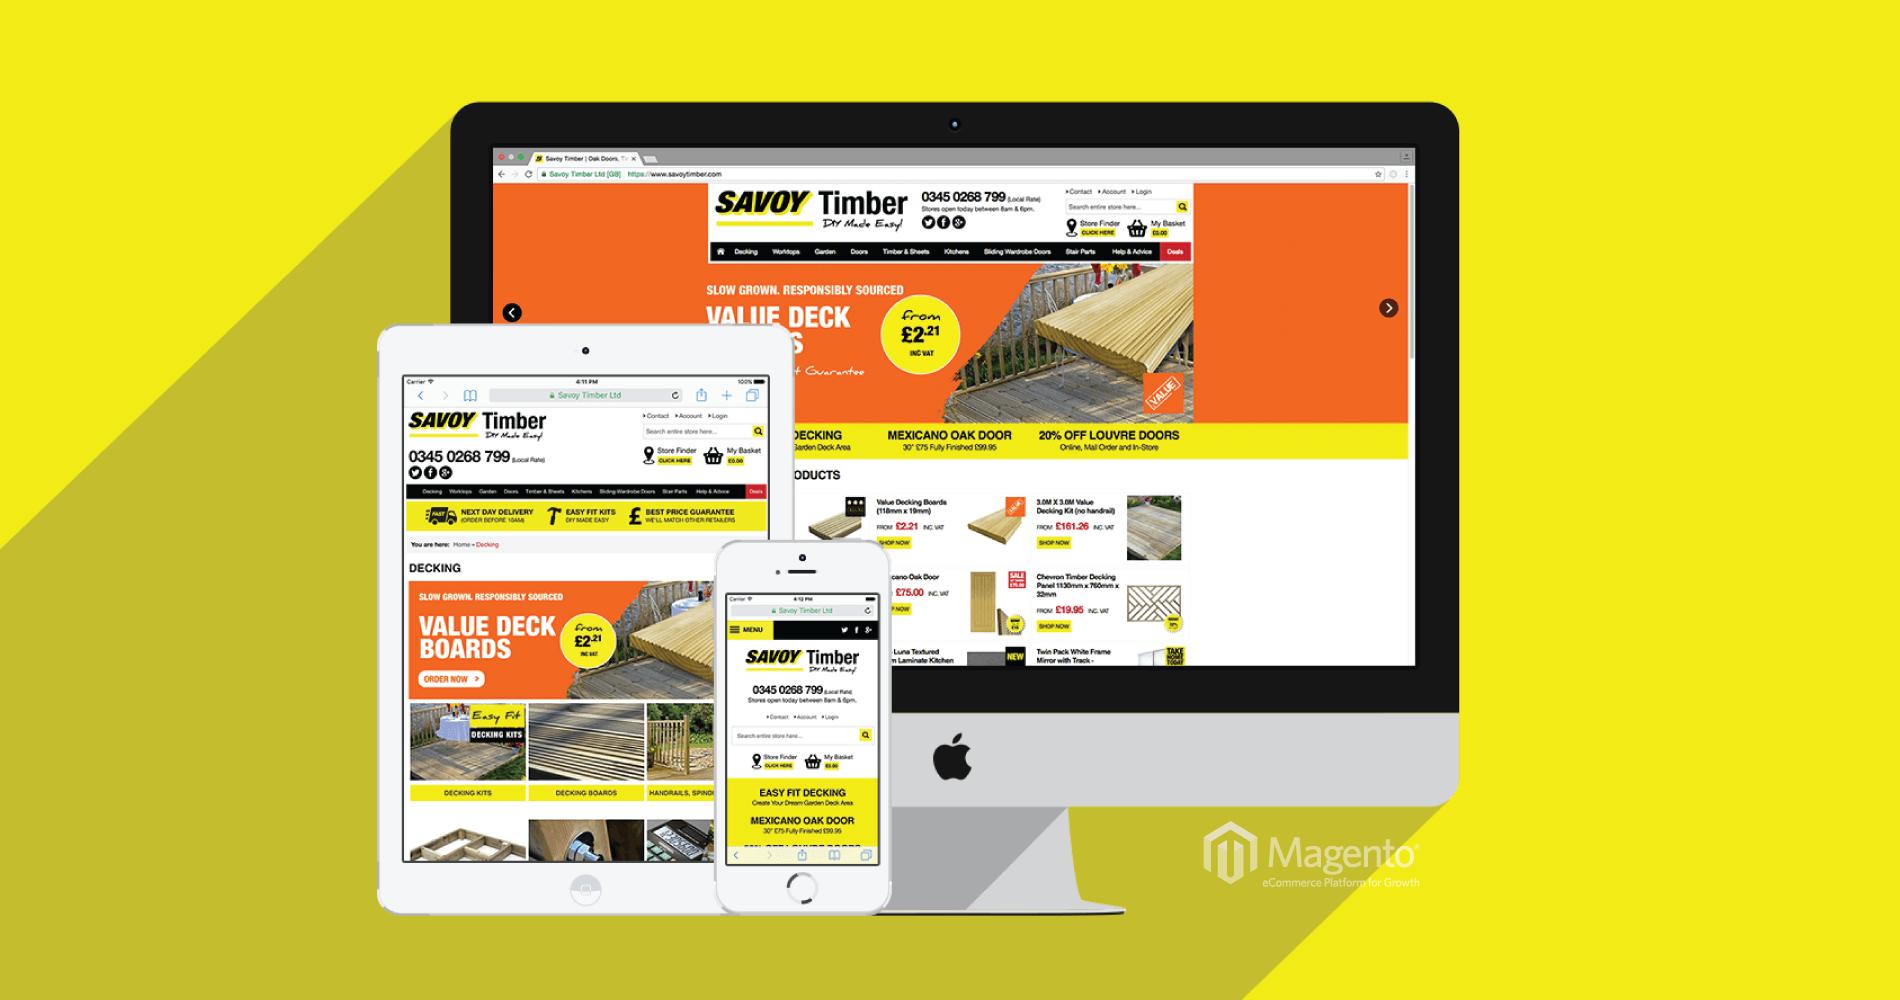 Savoy Timber - Magento Website